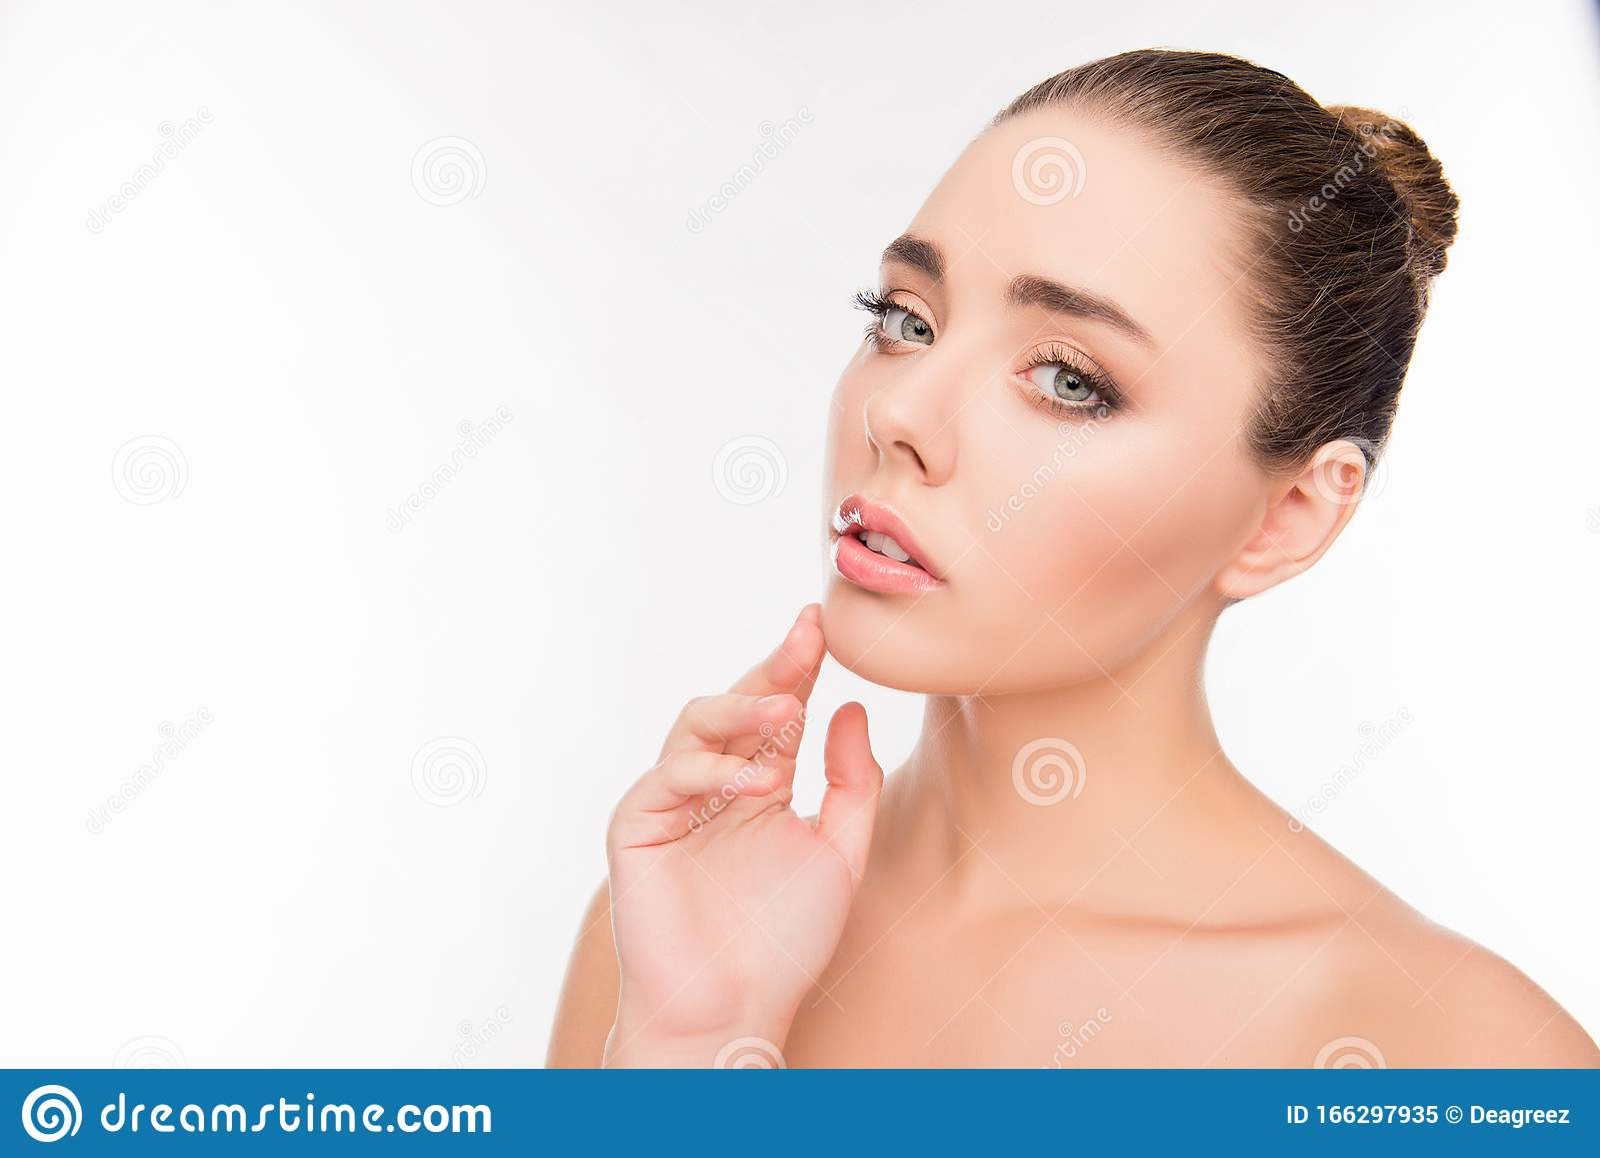 Premium Photo   Portrait of young beautiful caucasian